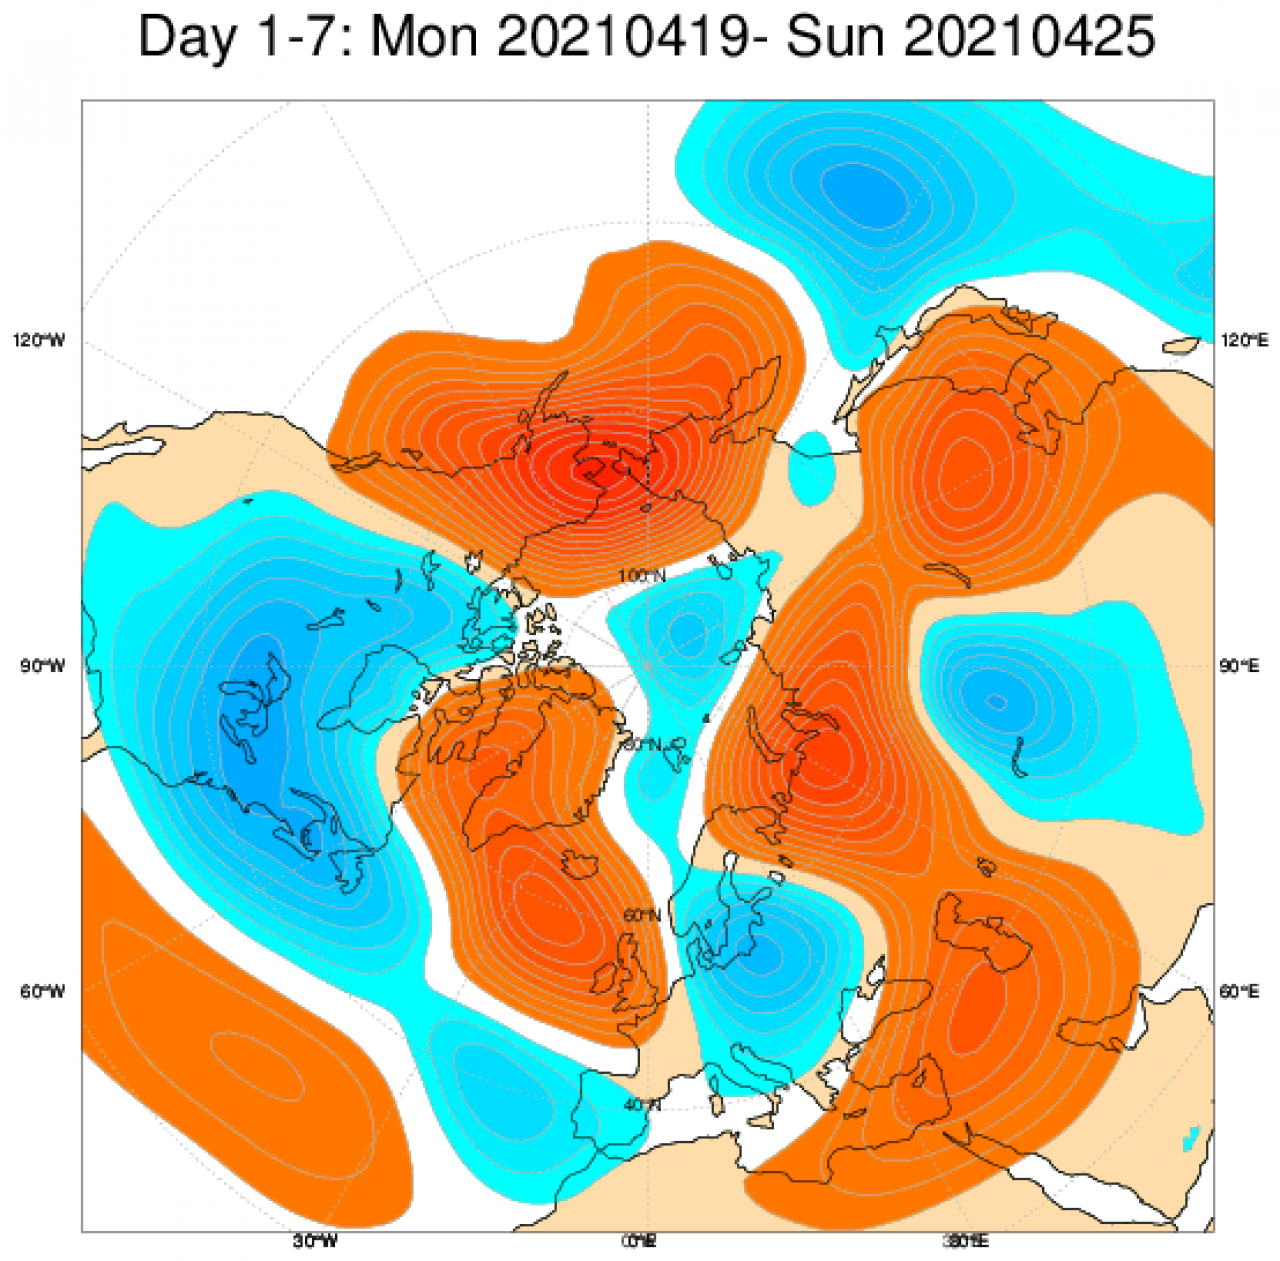 anomalie geopotenziali a 500 hPa secondo Ecmwf